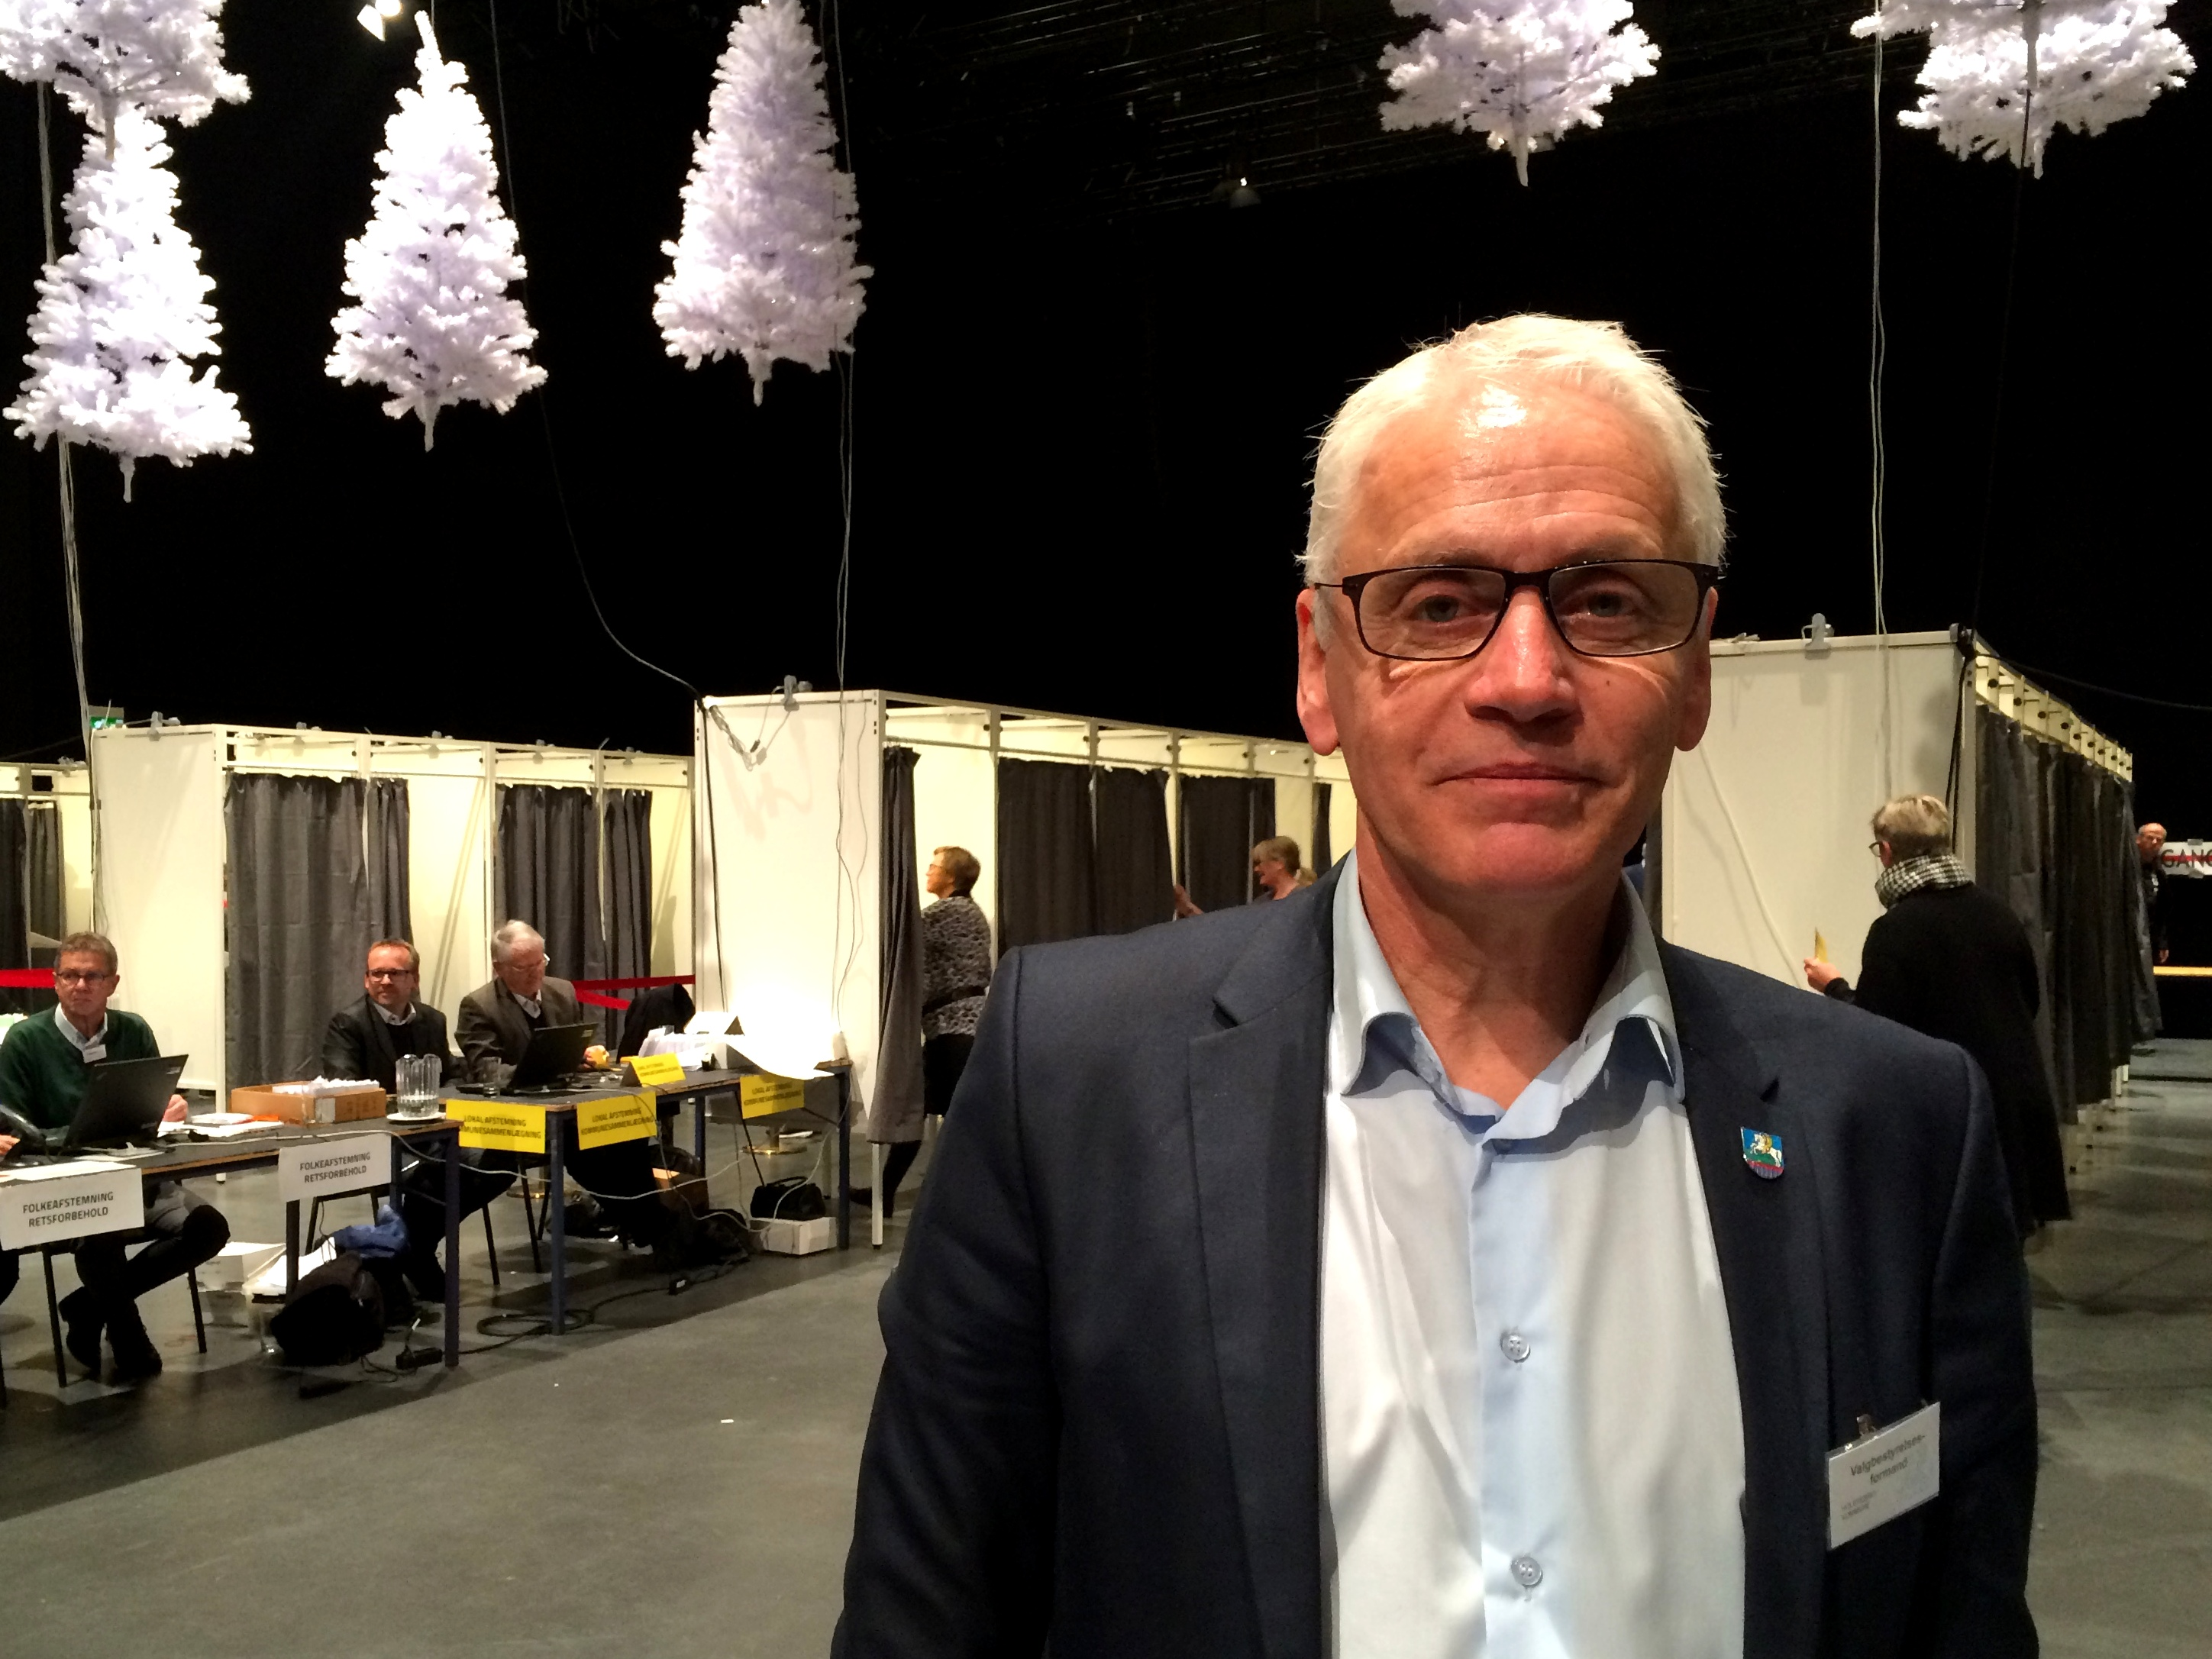 Borgmester i Holstebro, H.C. Østerby (A)